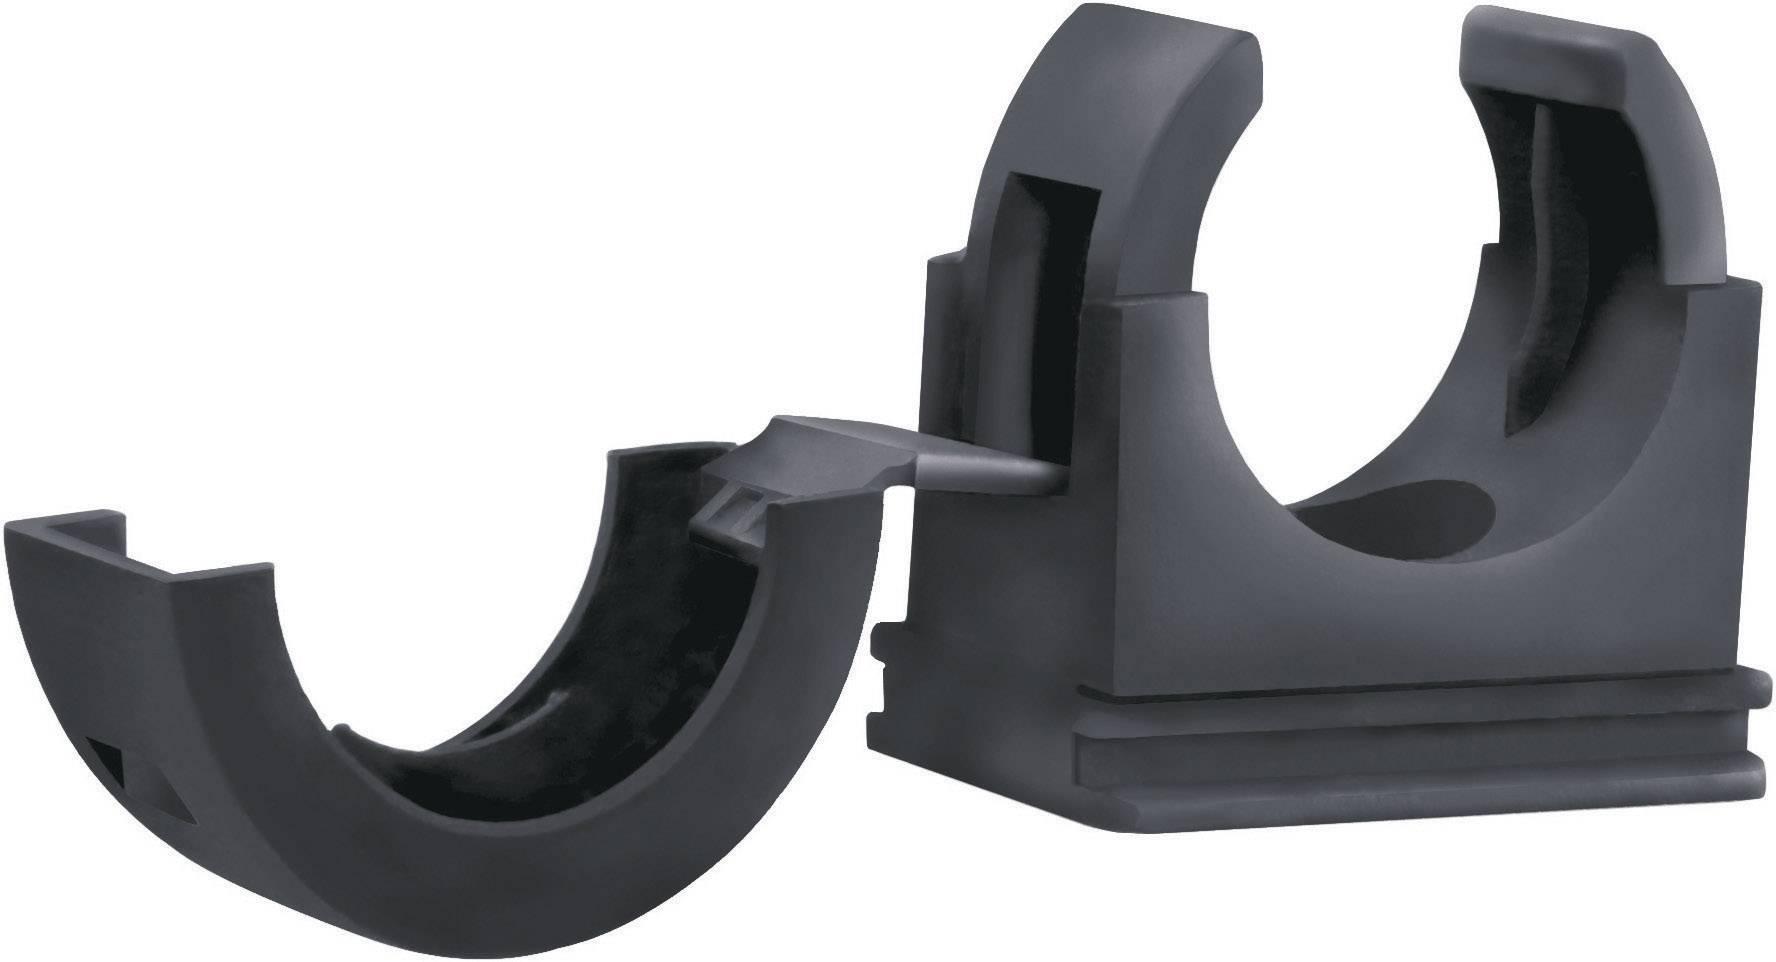 Držák hadice LAPP SILVYN® FCL 42 GY 55506960, 42 mm, šedá, 5 ks